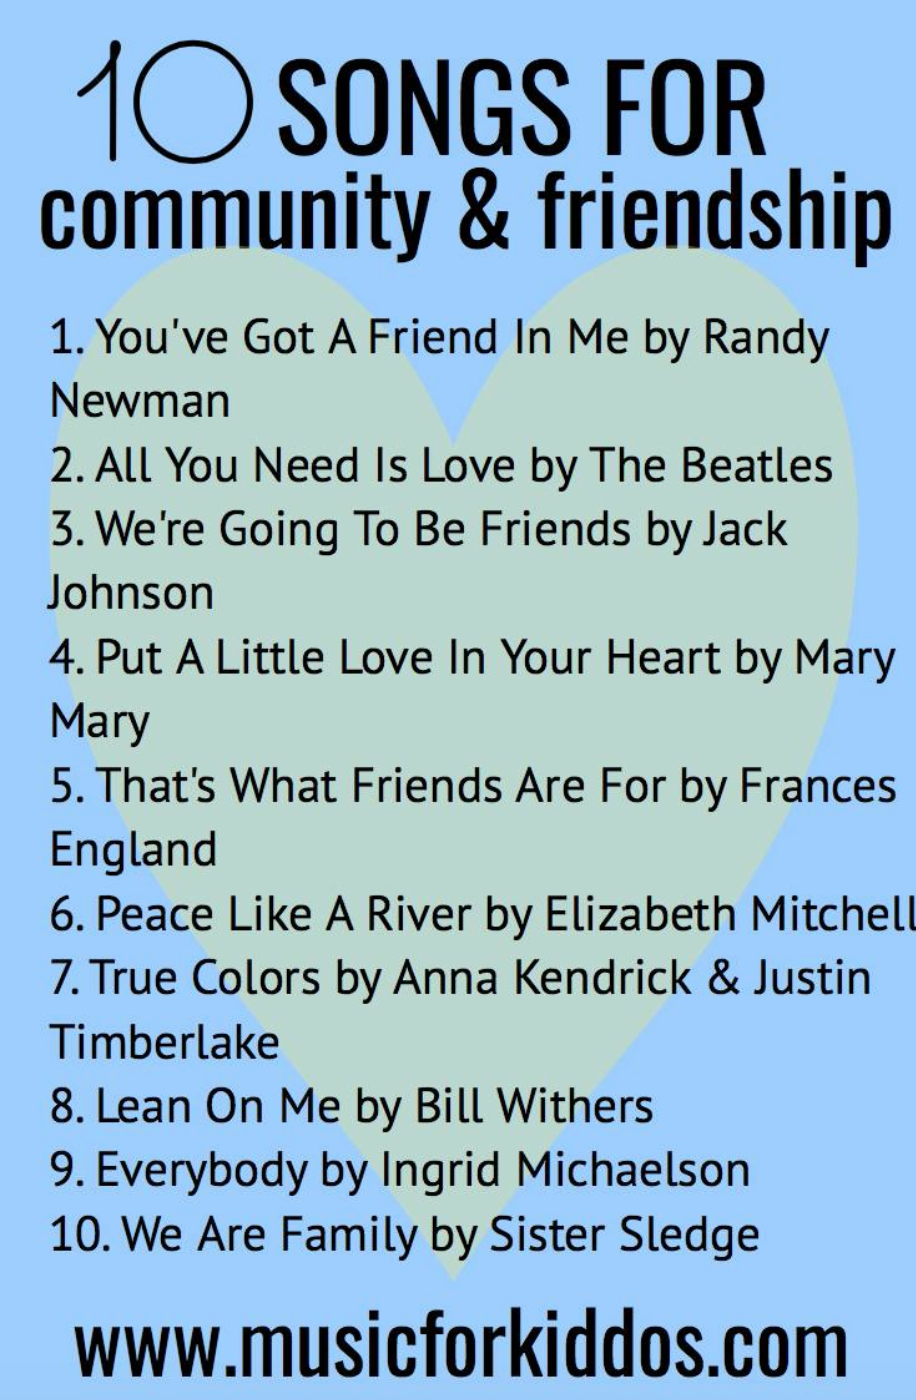 10 Songs for Community & Friendship